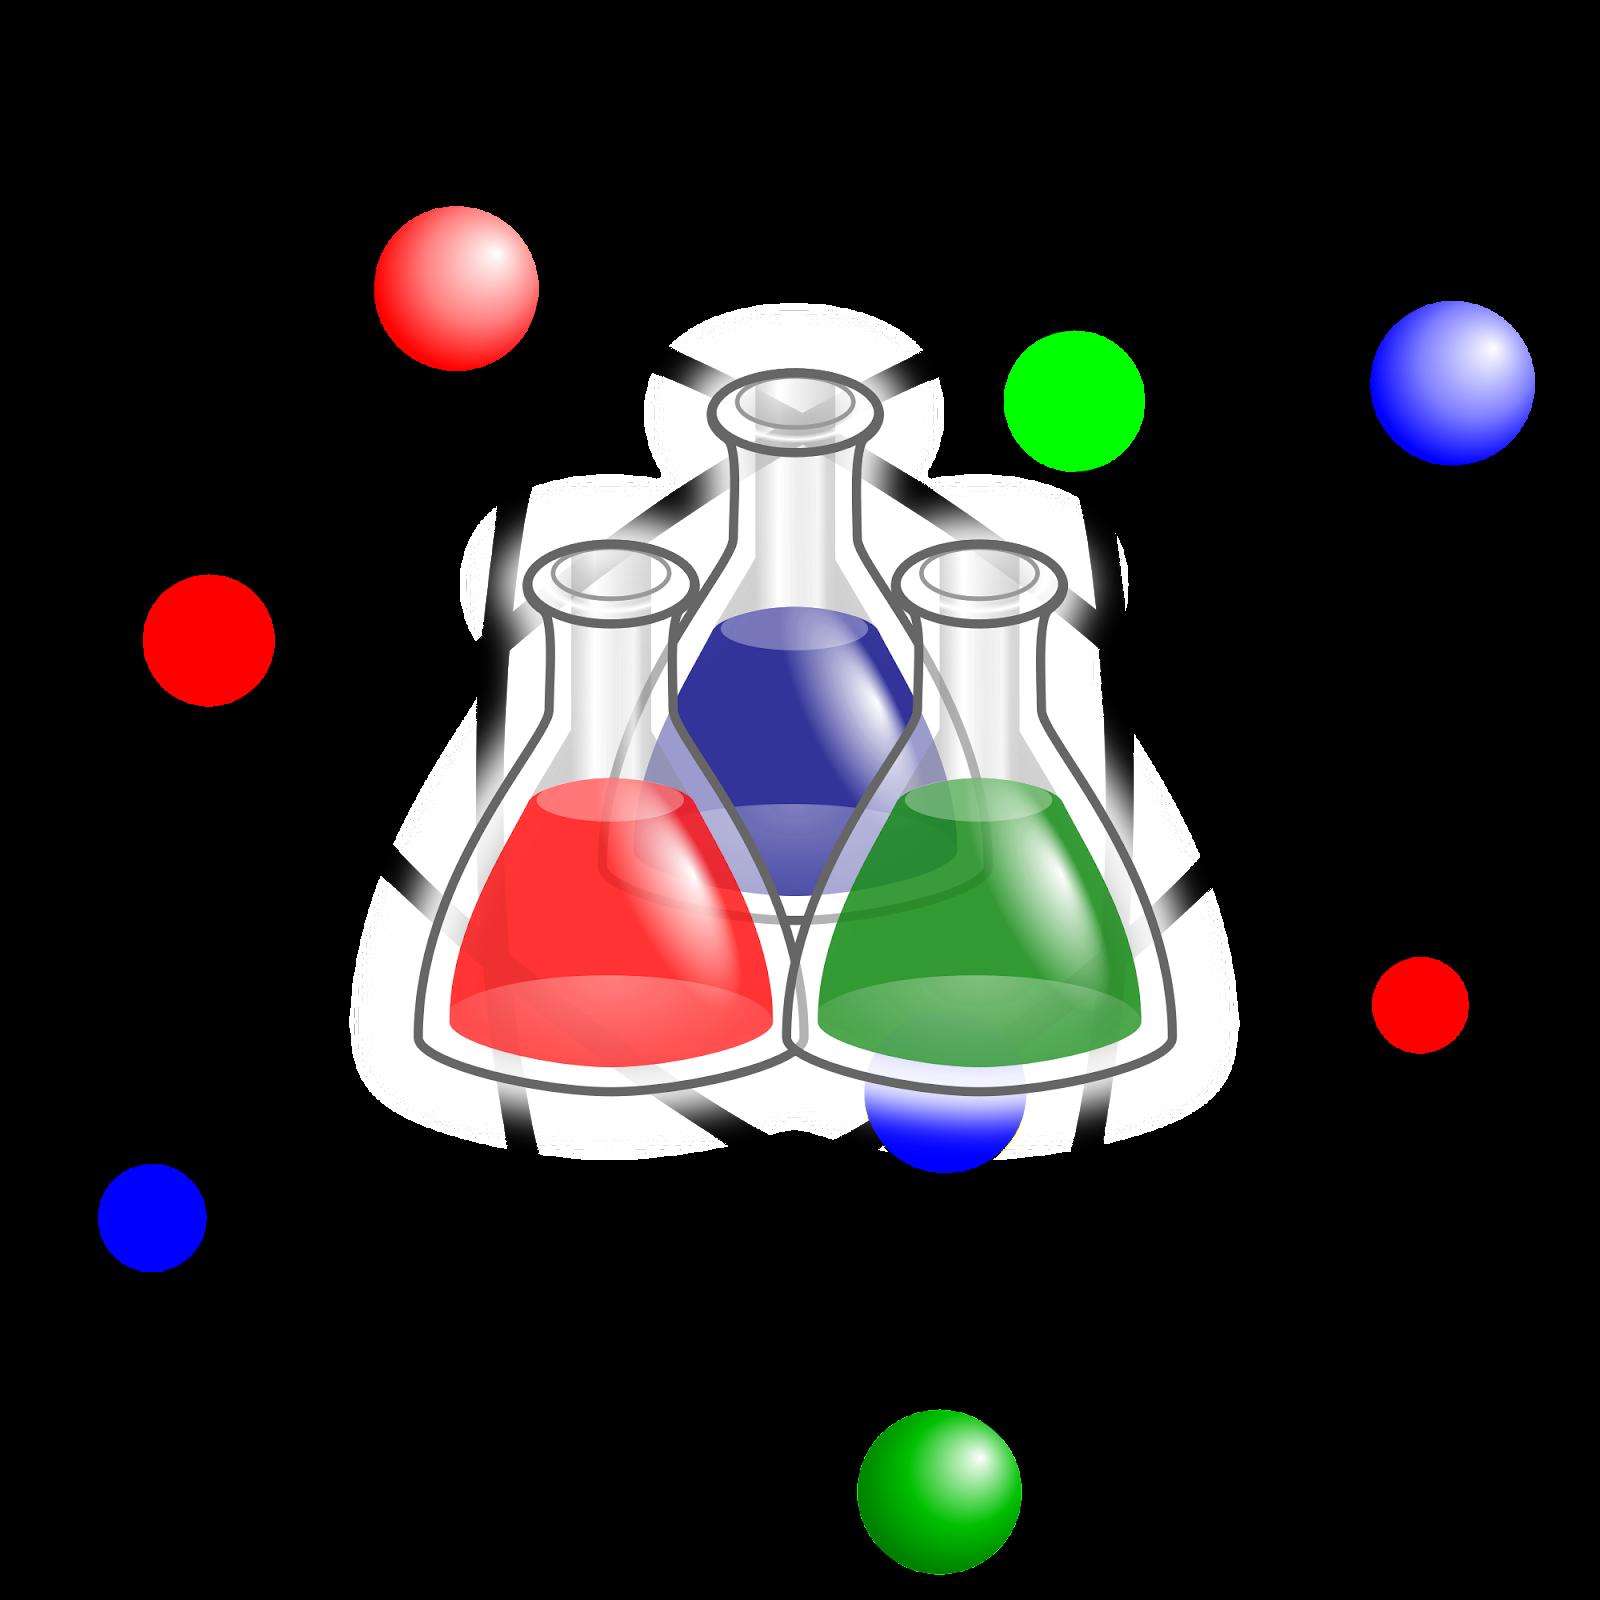 New SVG image